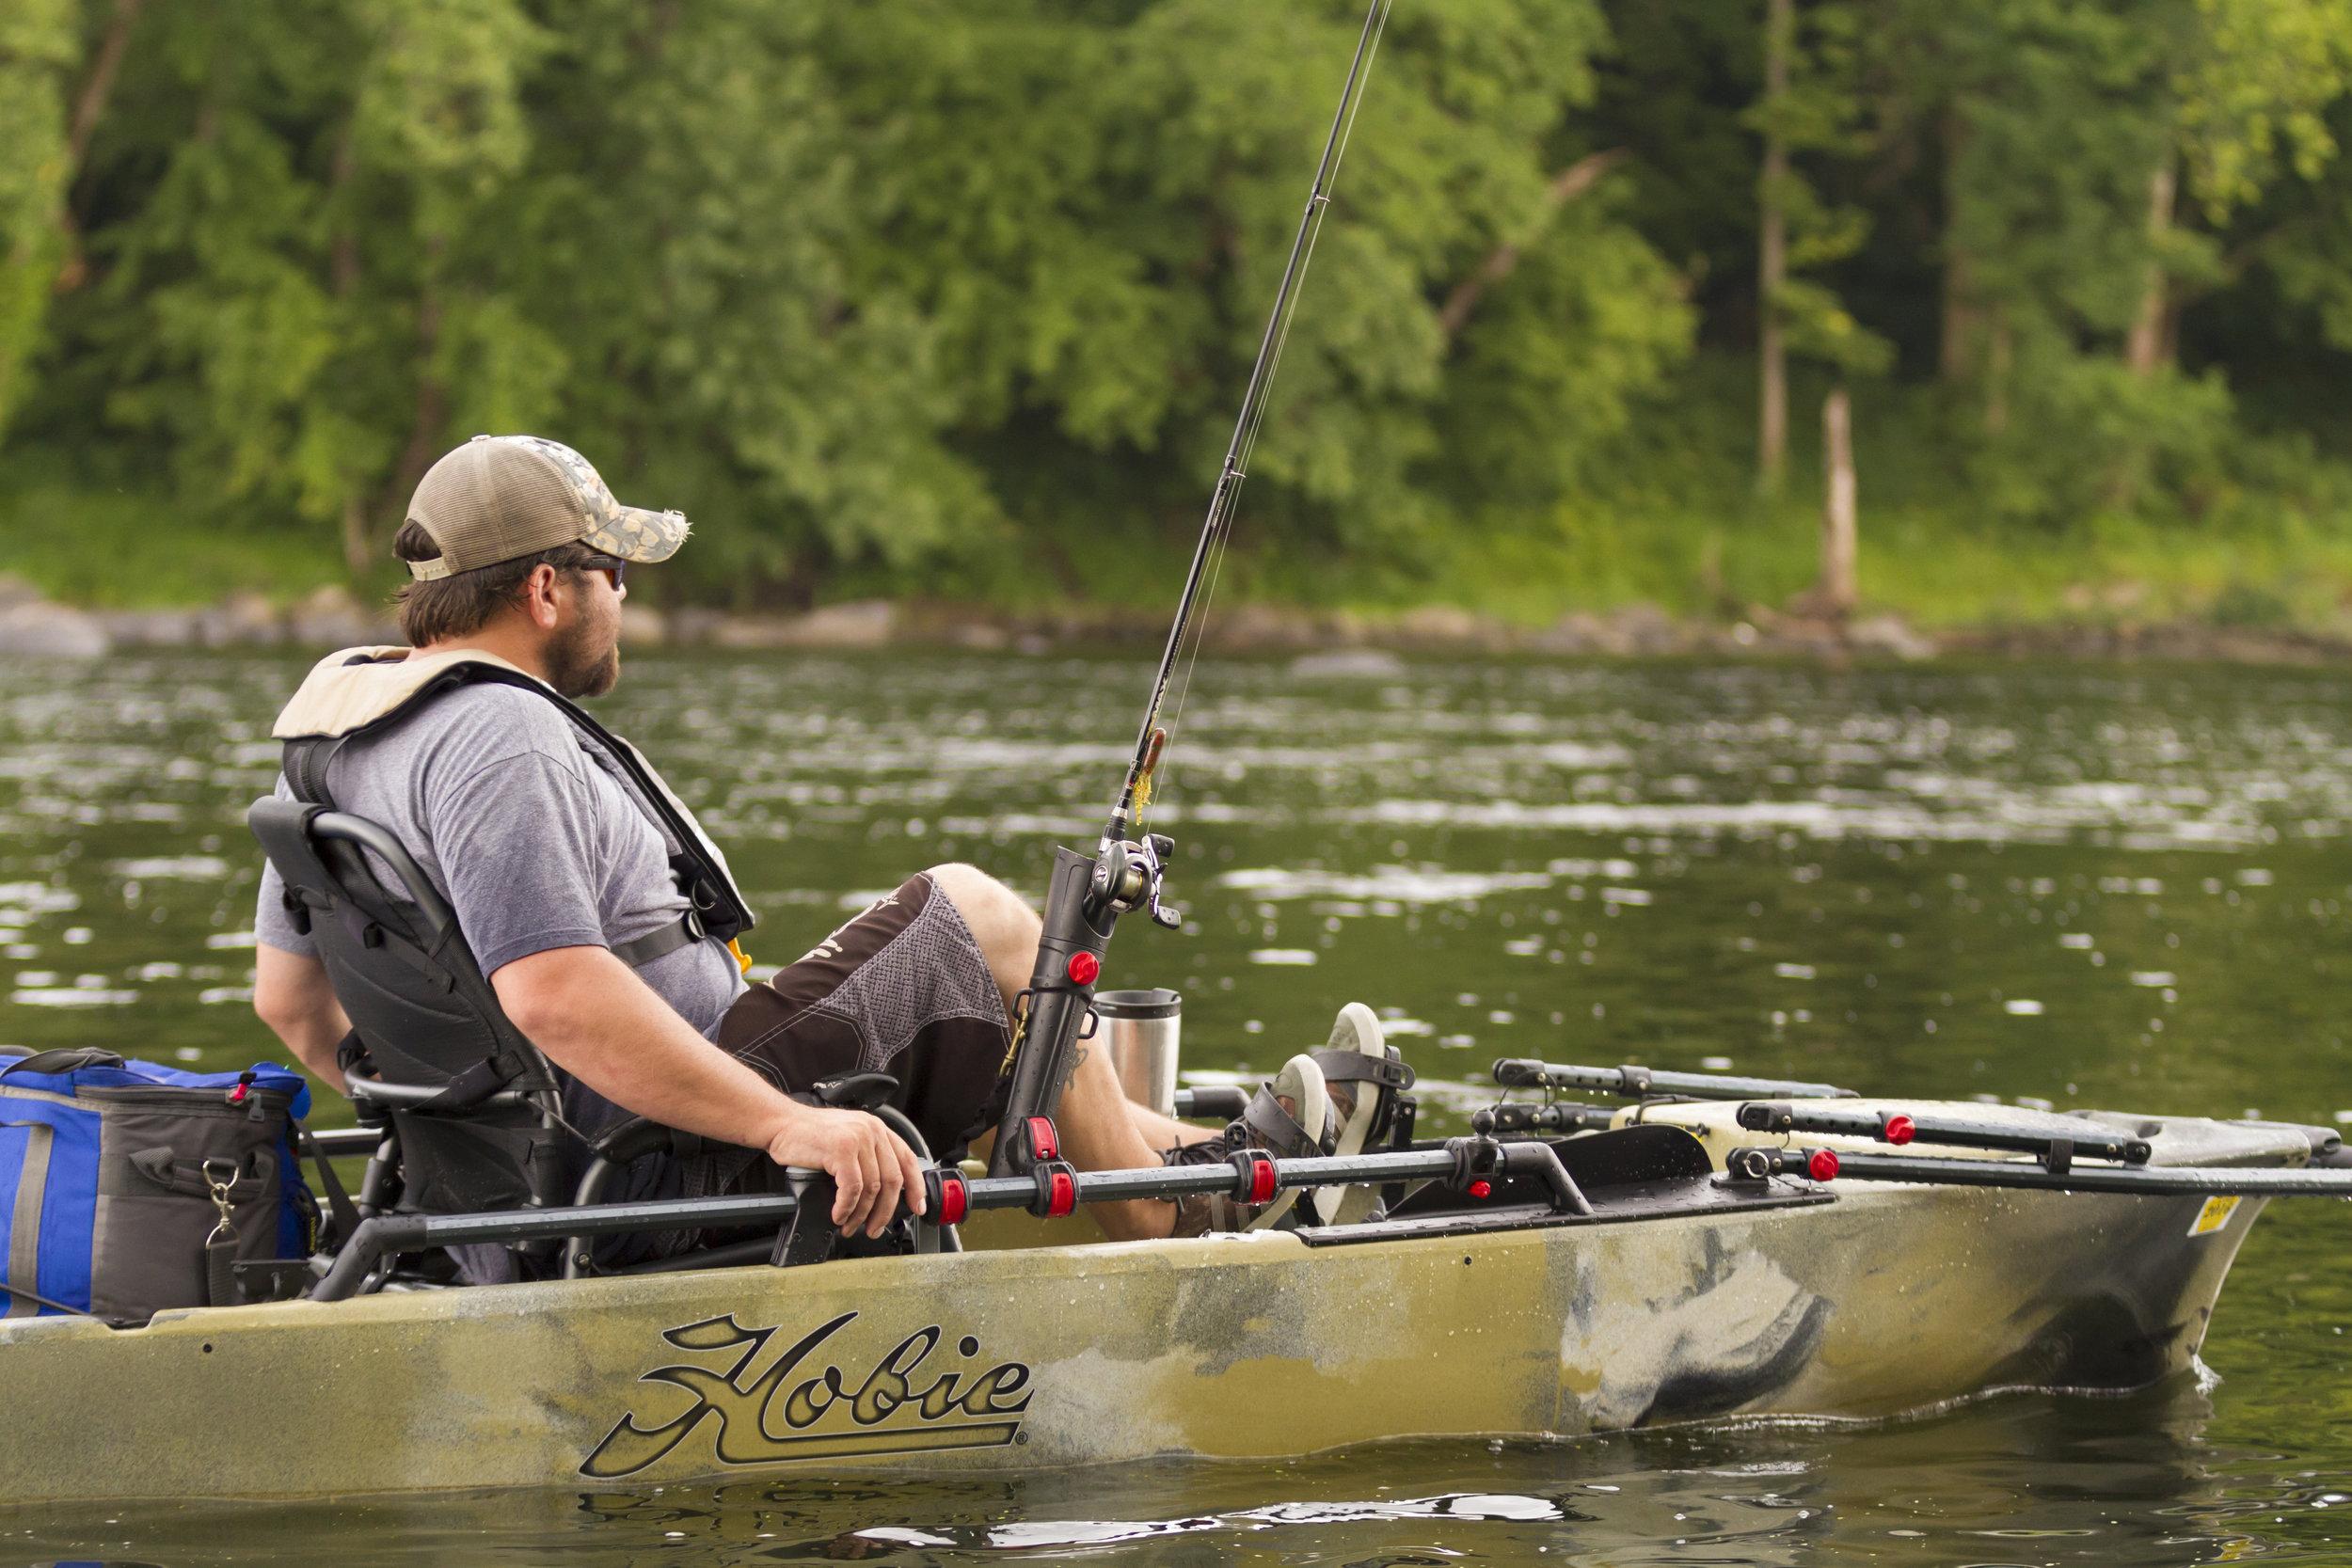 ProAngler12-action-fishing-camo-river-C1-cruise-5324-full.jpg